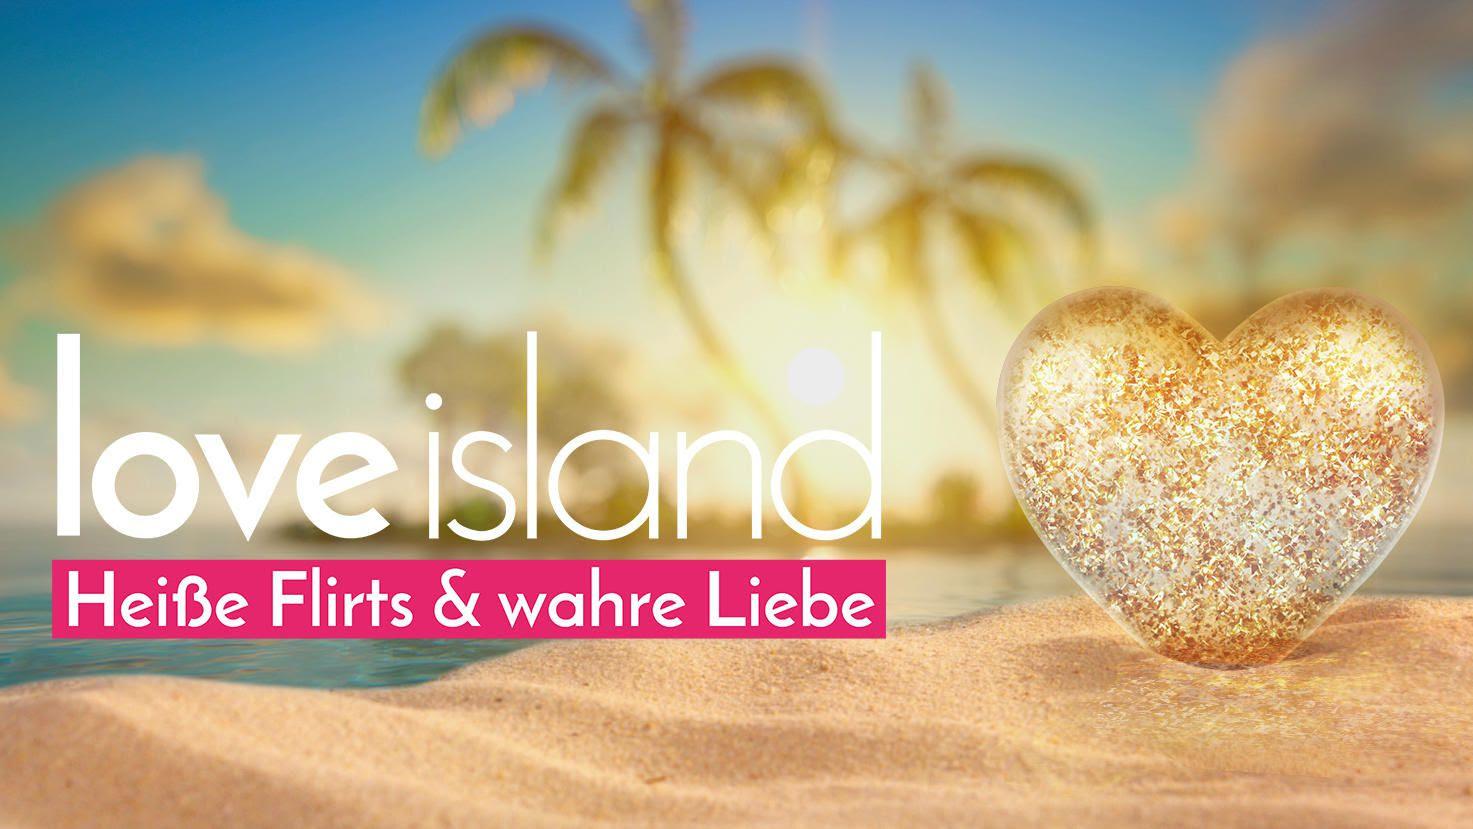 Love Island 2021 Kandidaten - Mscff6i8ymp0lm : Deshalb ...